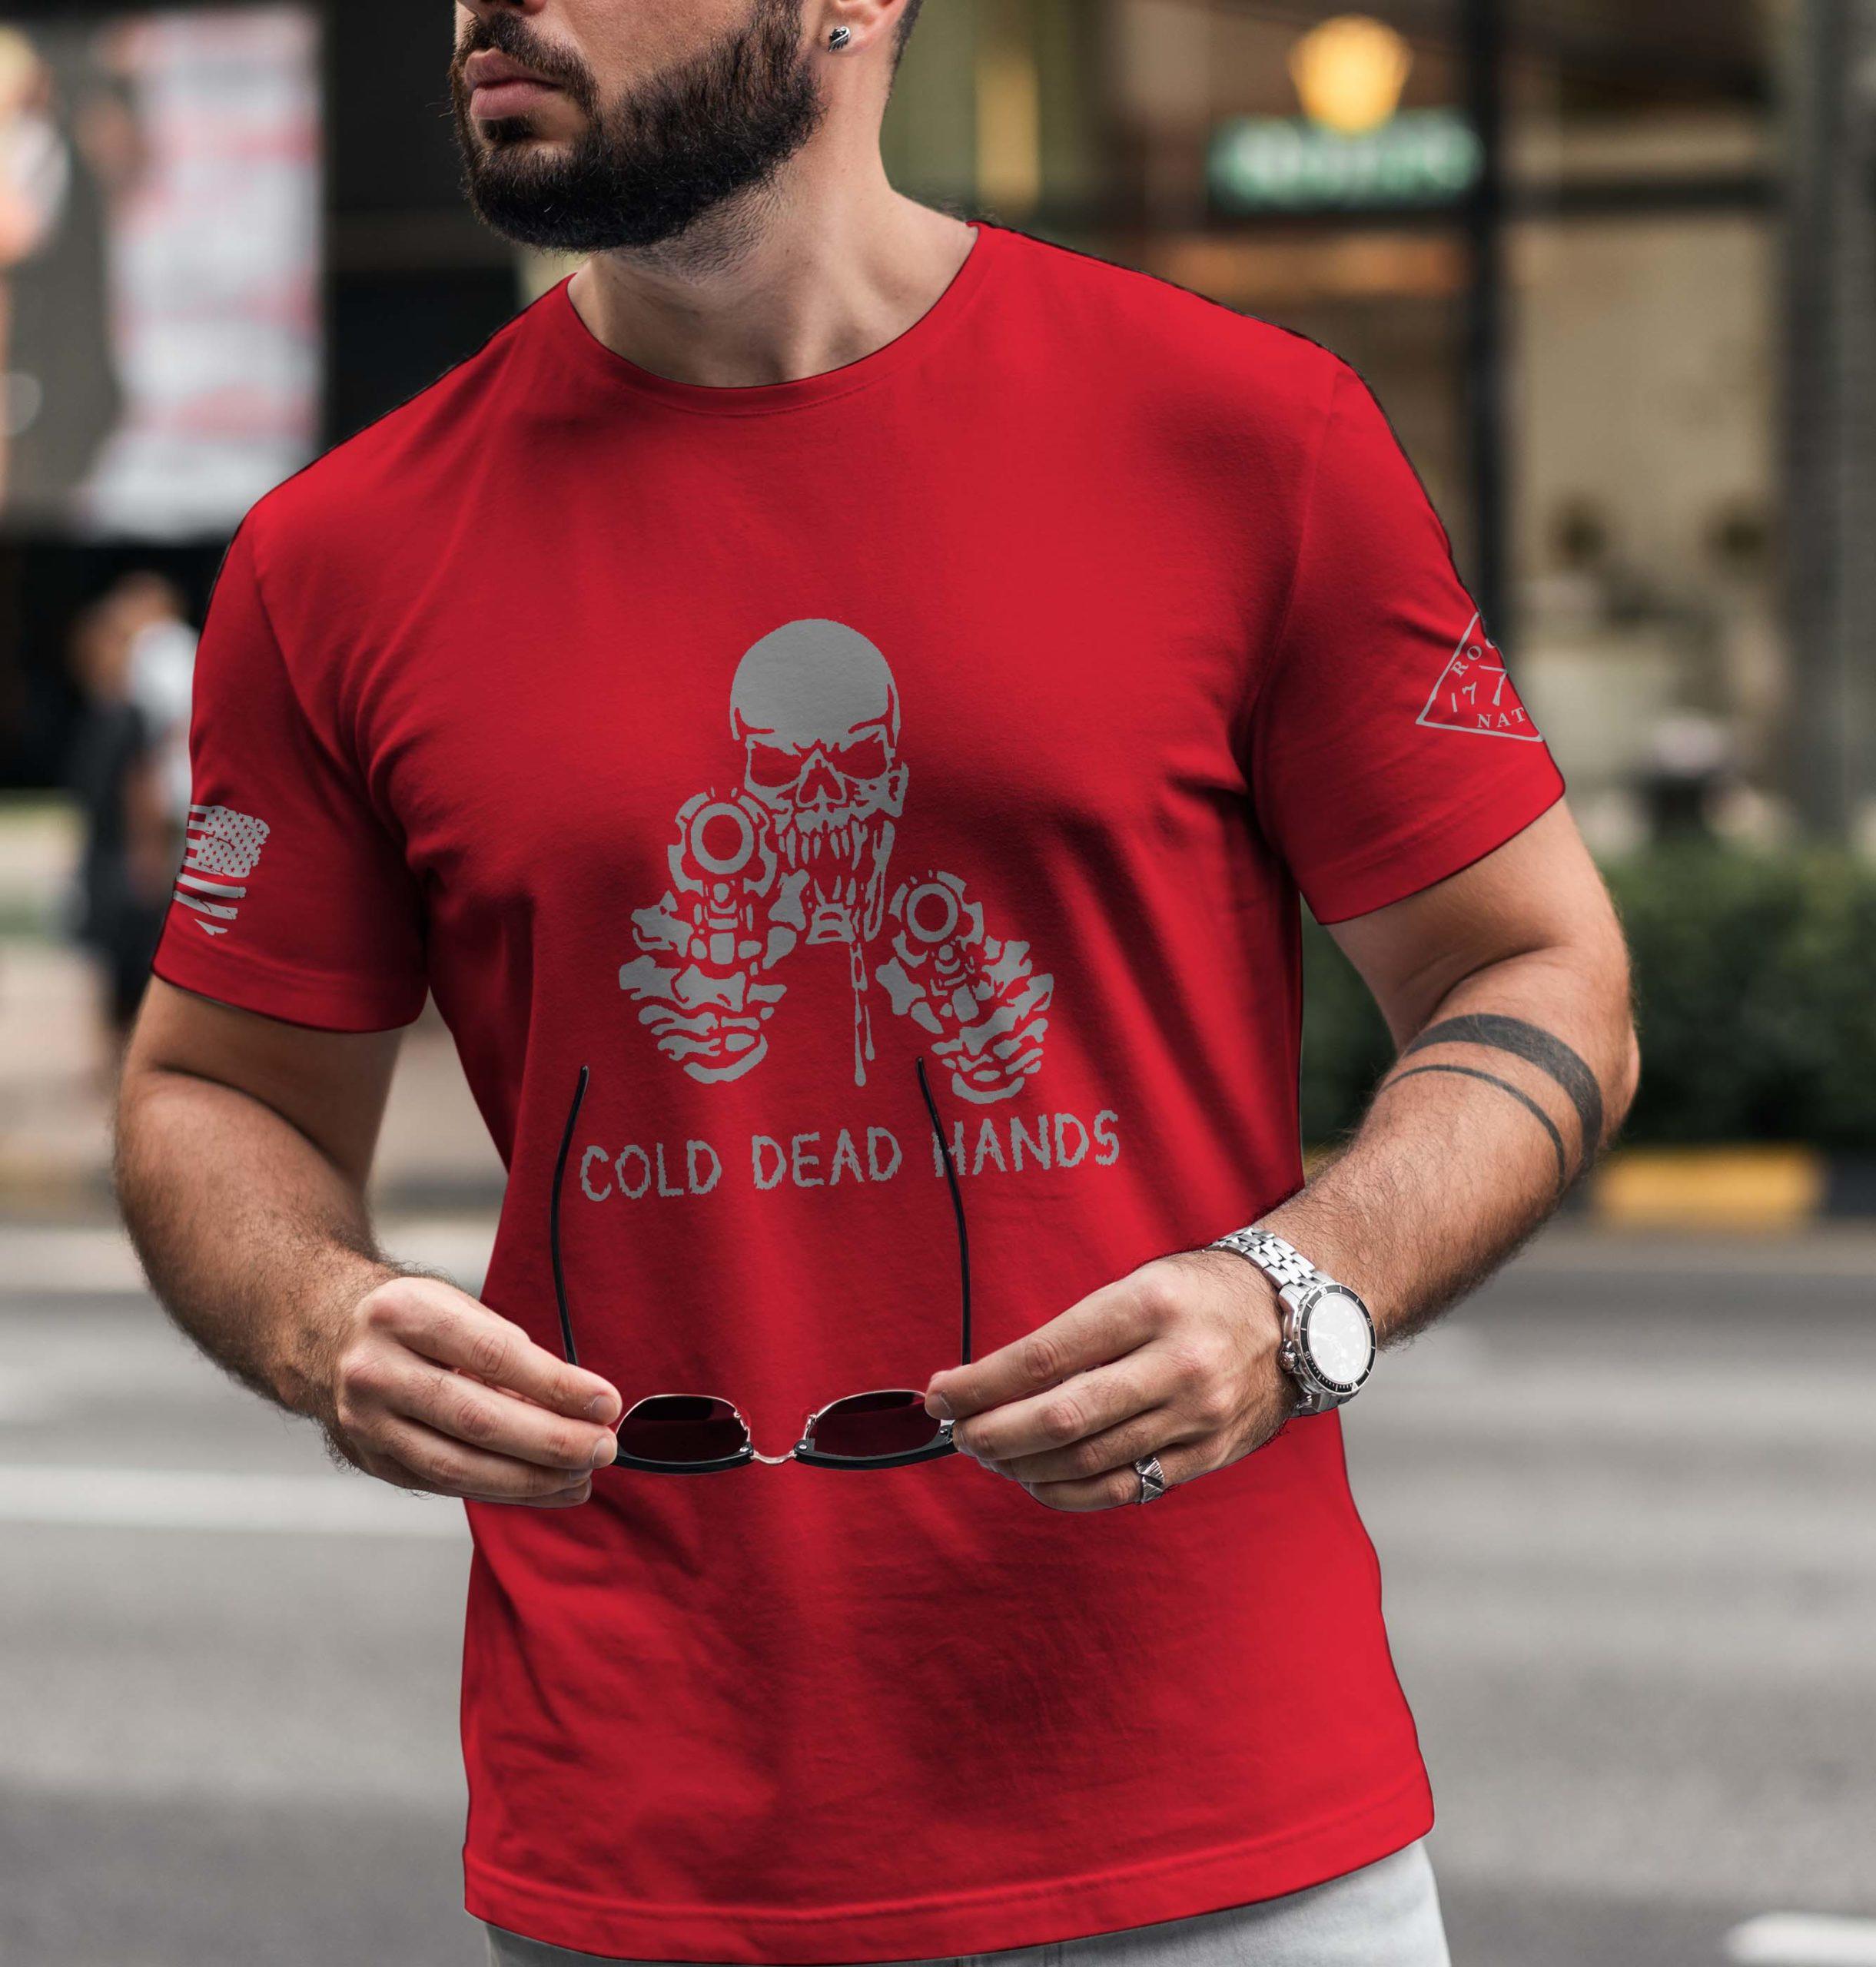 t-shirt cold dead hands red men's